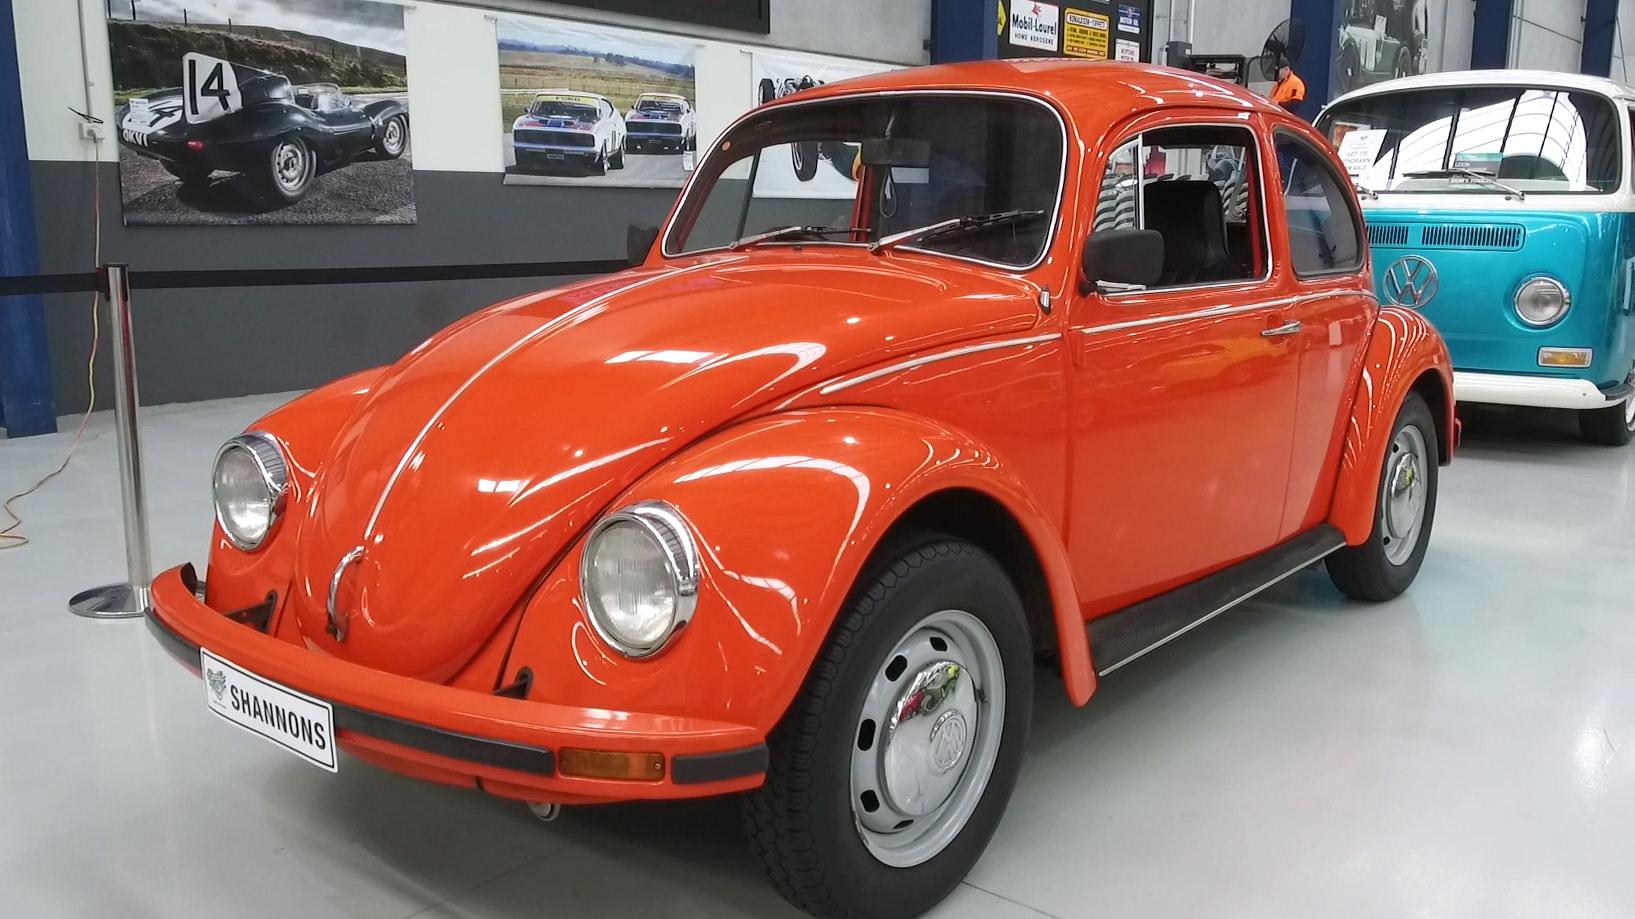 1976 Volkswagen Beetle 1600 Sedan - 2021 Shannons Spring Timed Online Auction